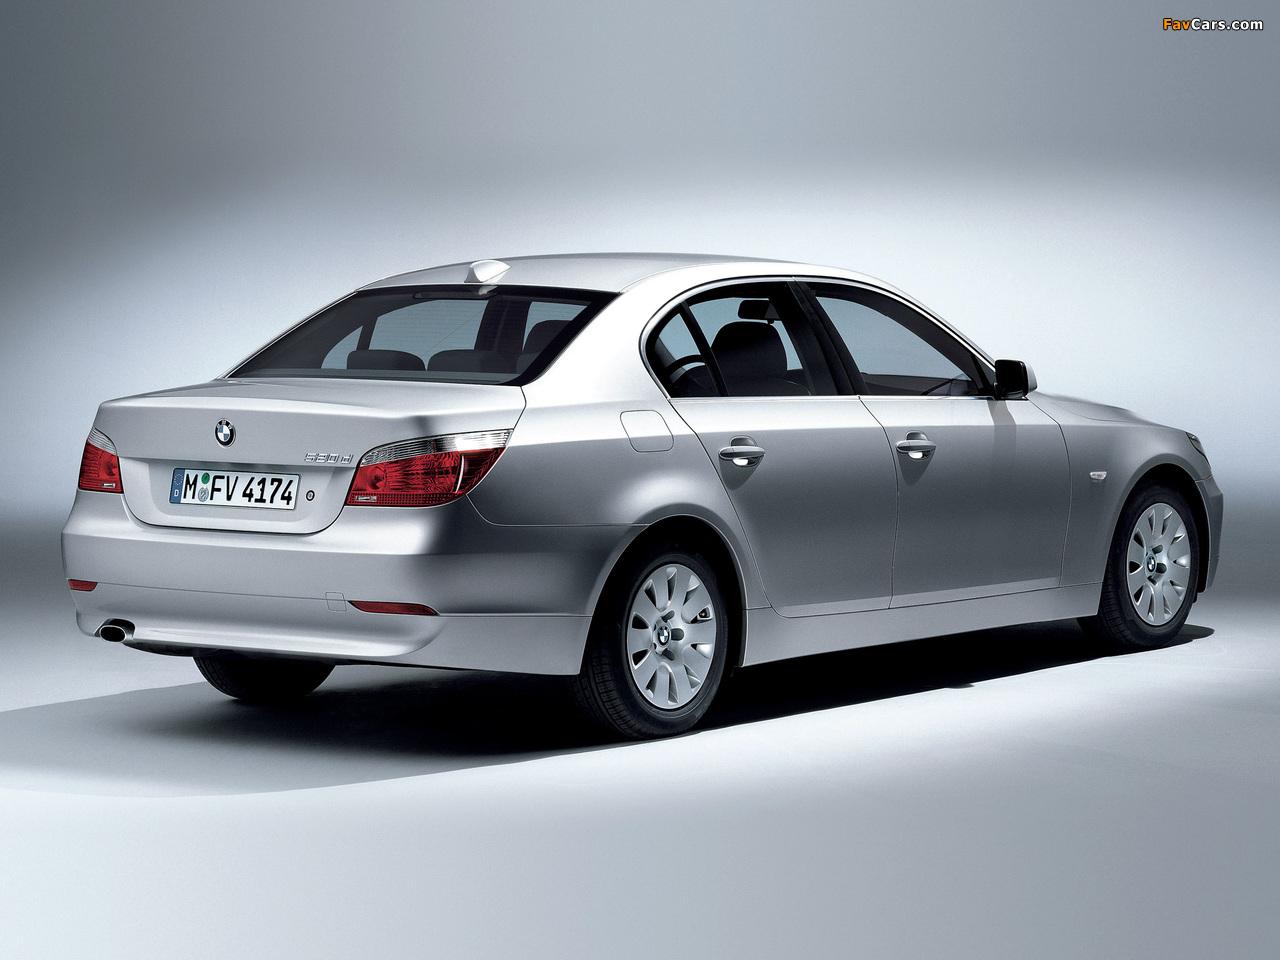 BMW 520d Sedan (E60) 2005–07 wallpapers (1280 x 960)